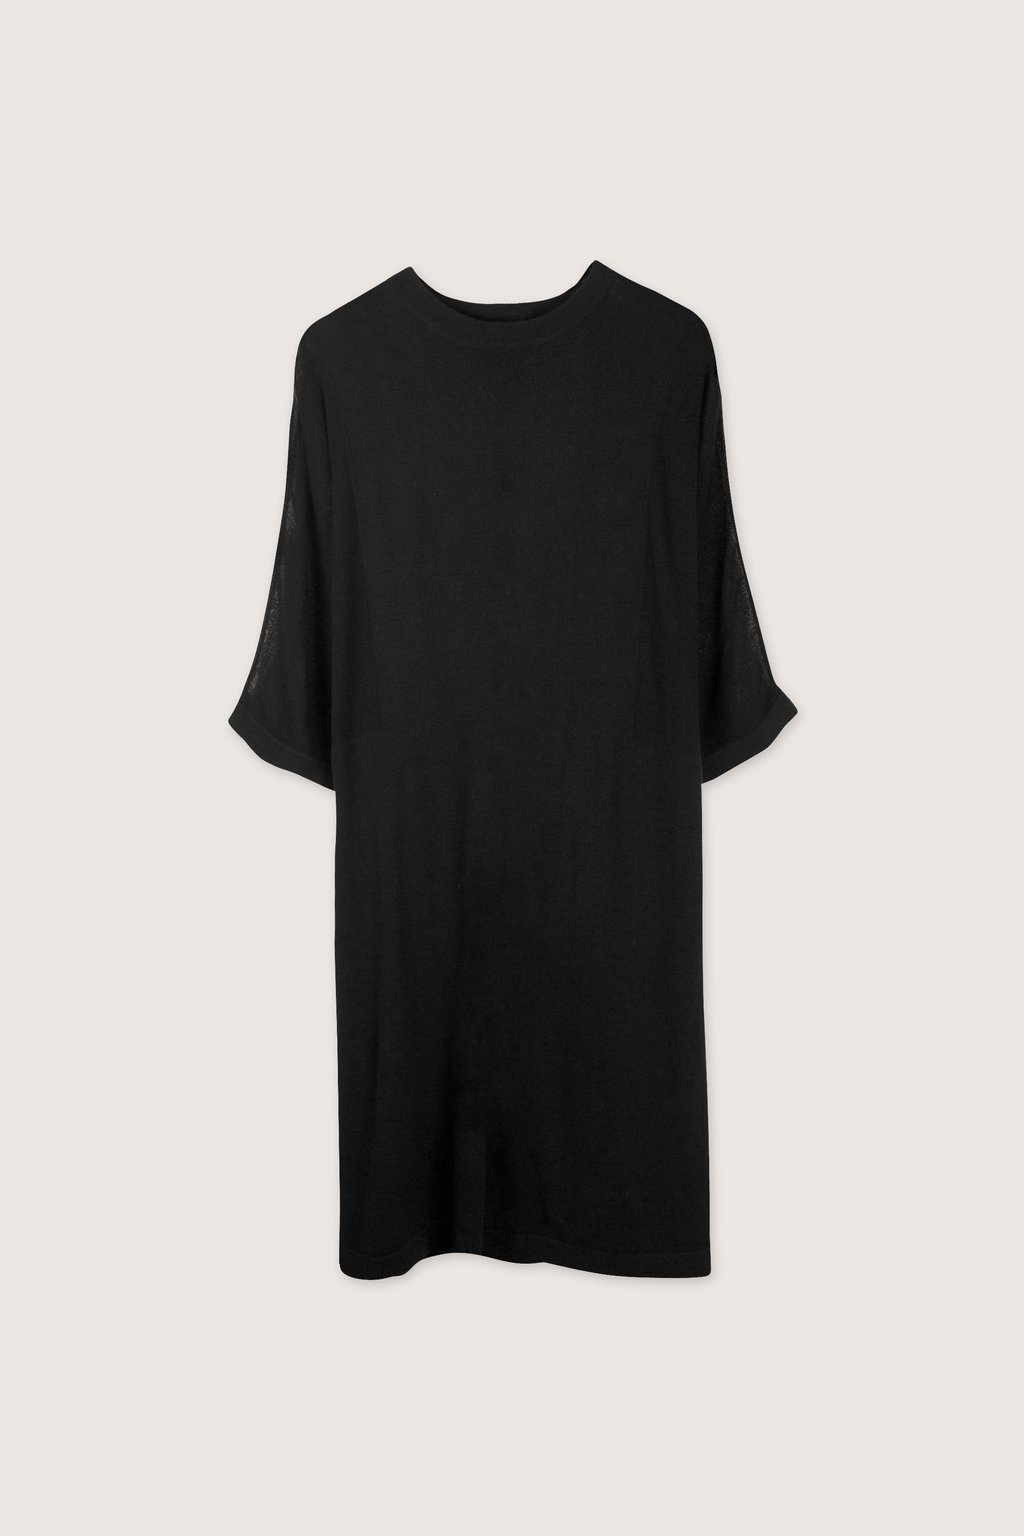 Dress 1719 Black 5